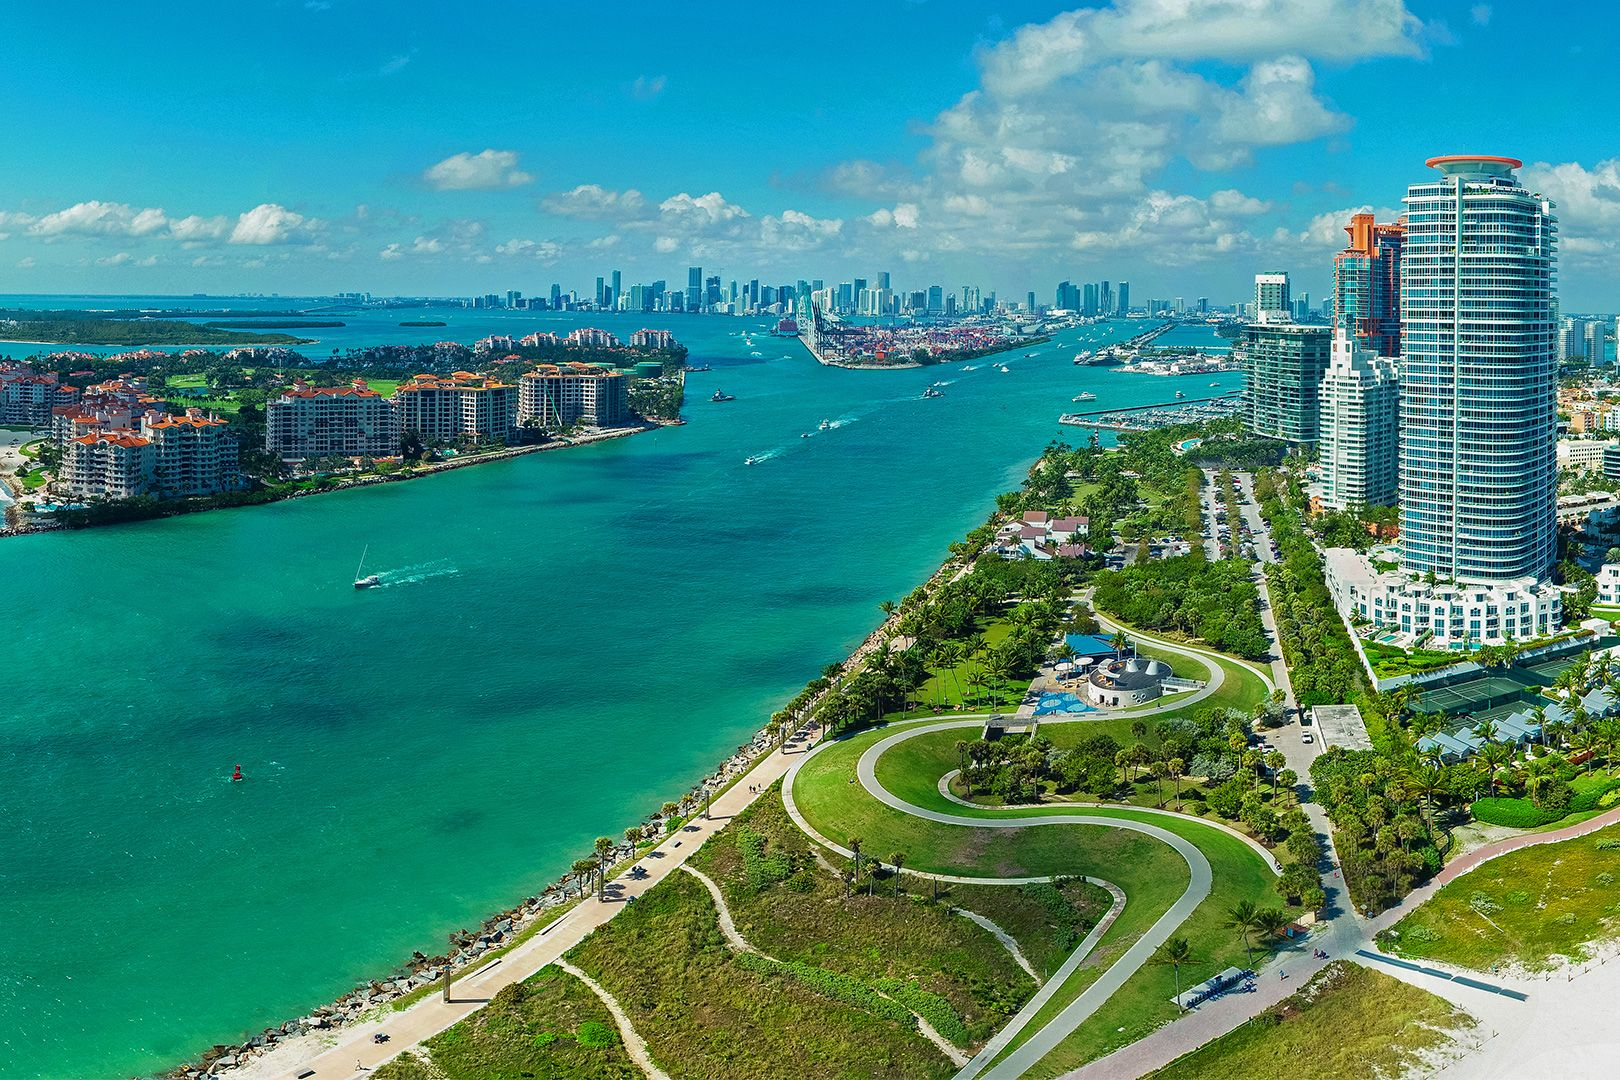 Circuit de grup - Explore SUA Est - New York & Miami, 10 zile - 27 noiembrie 2021